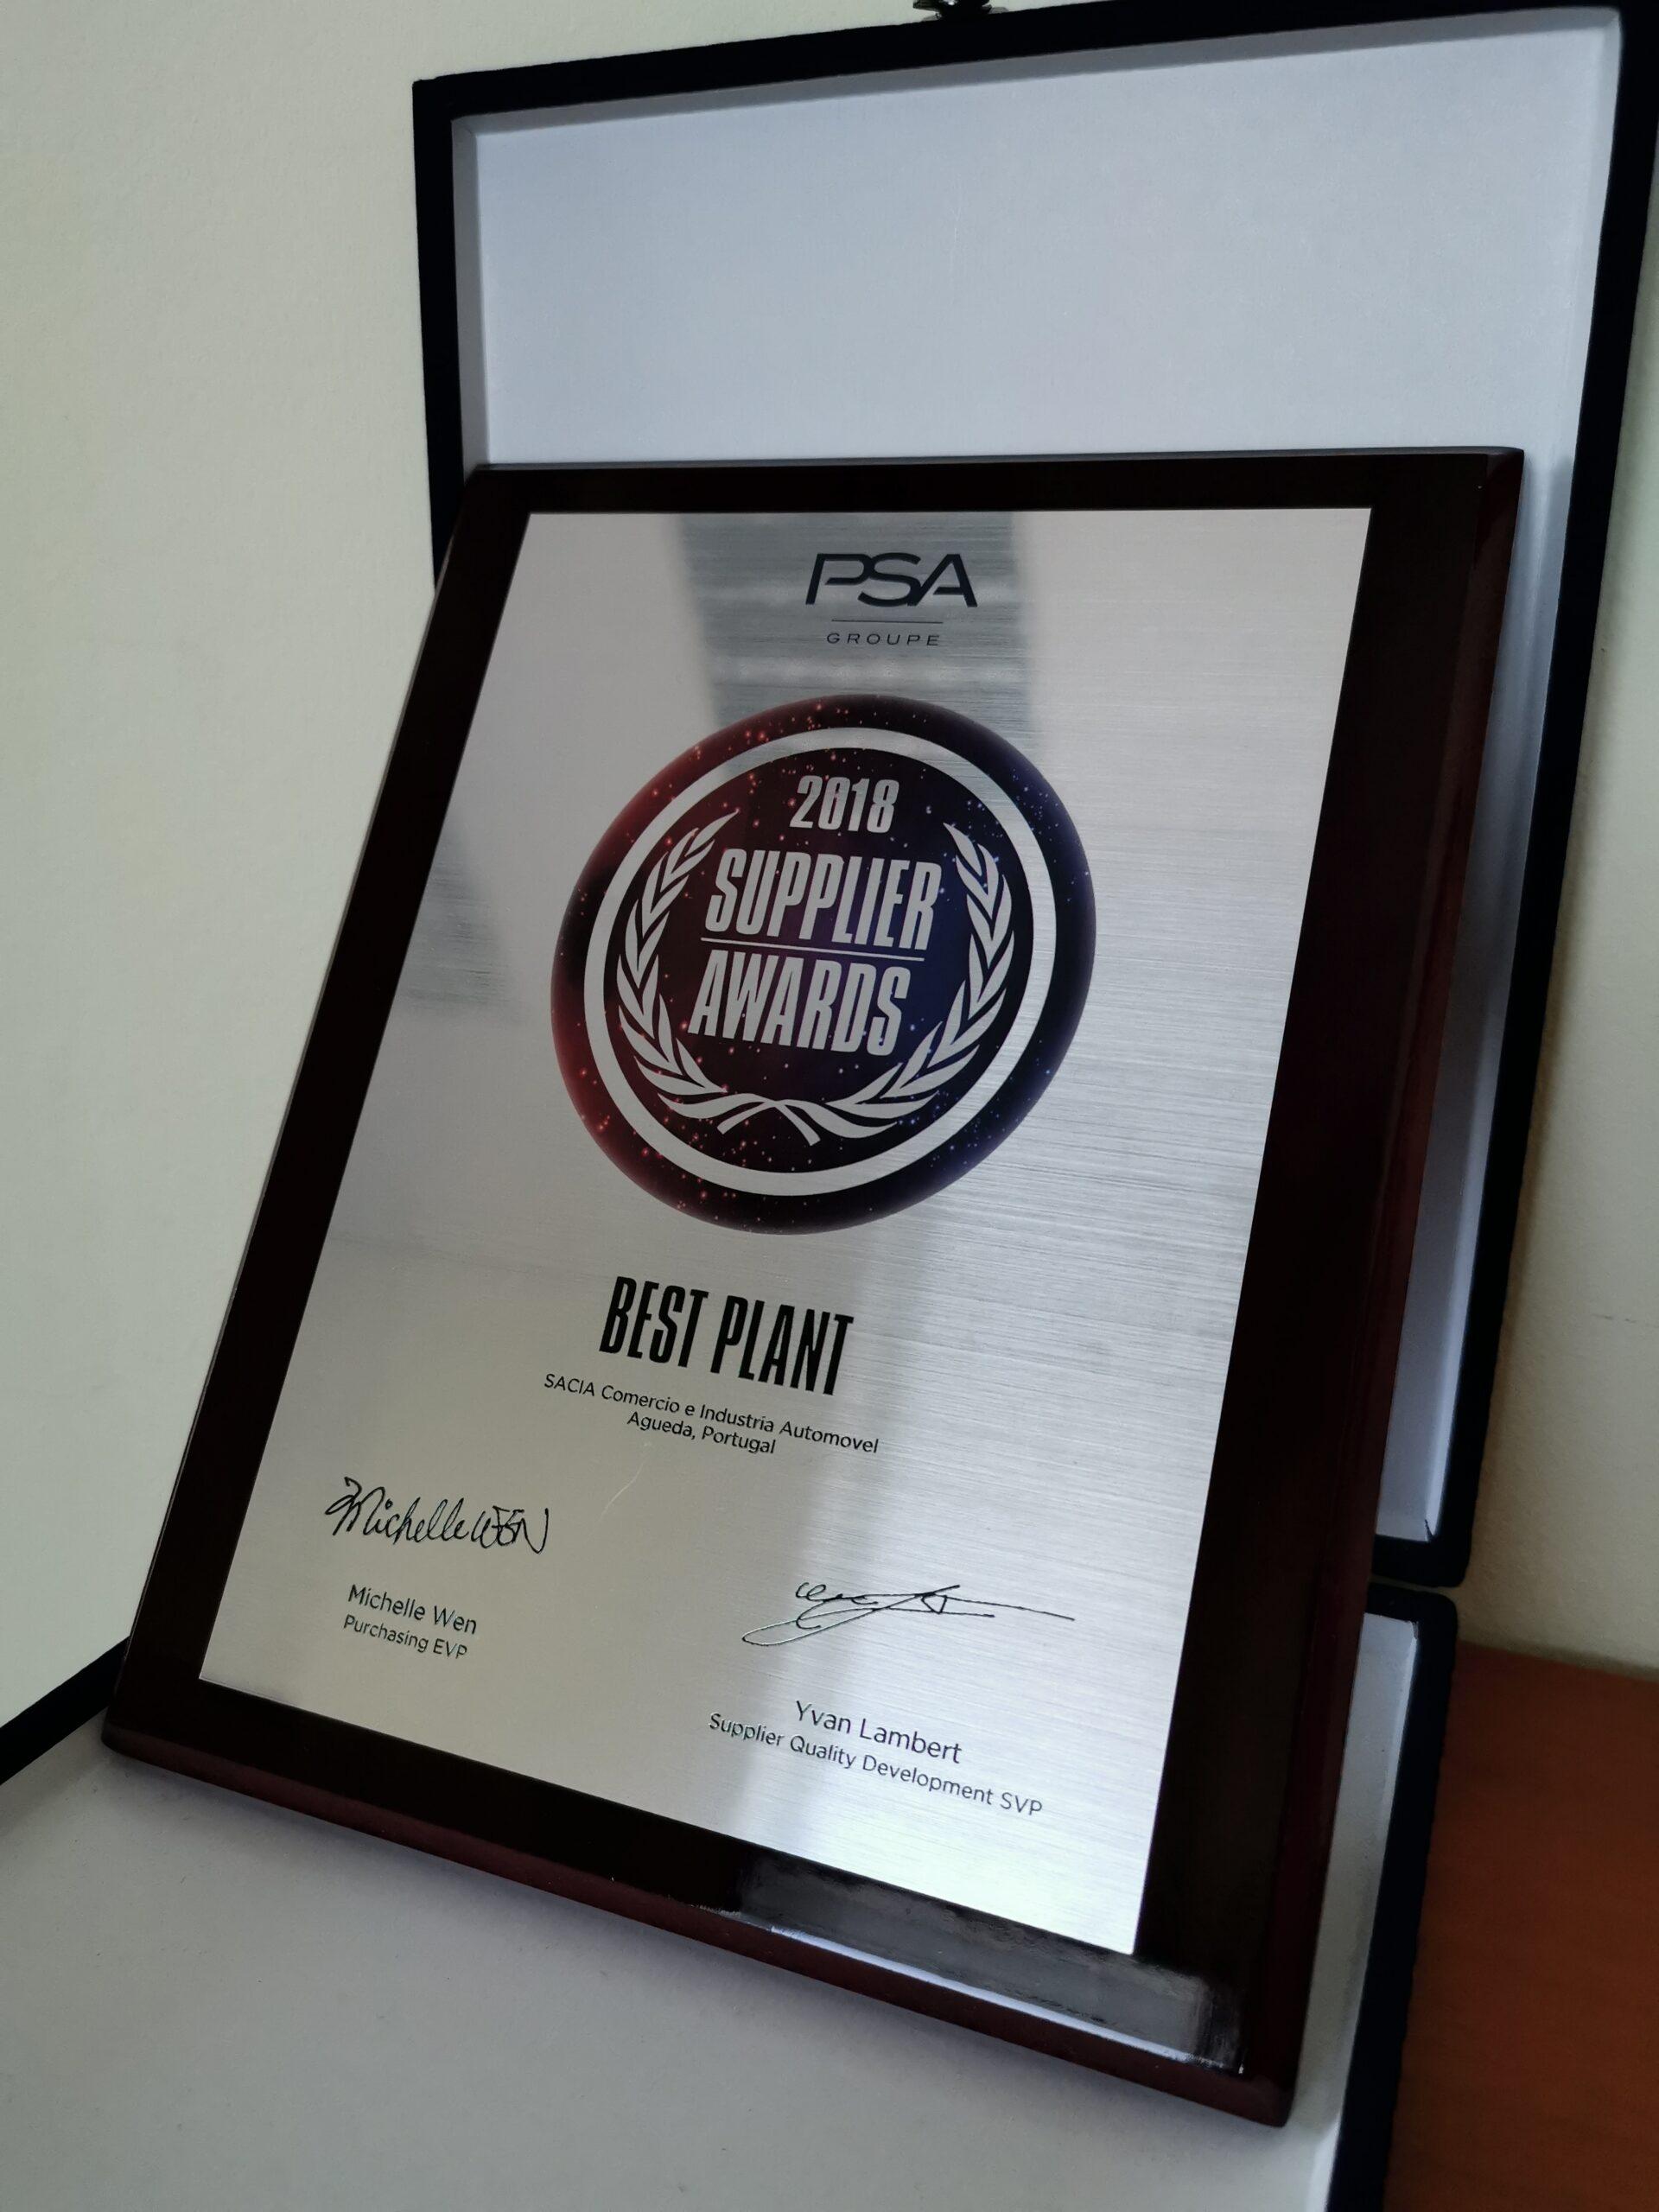 Best Plant 2018